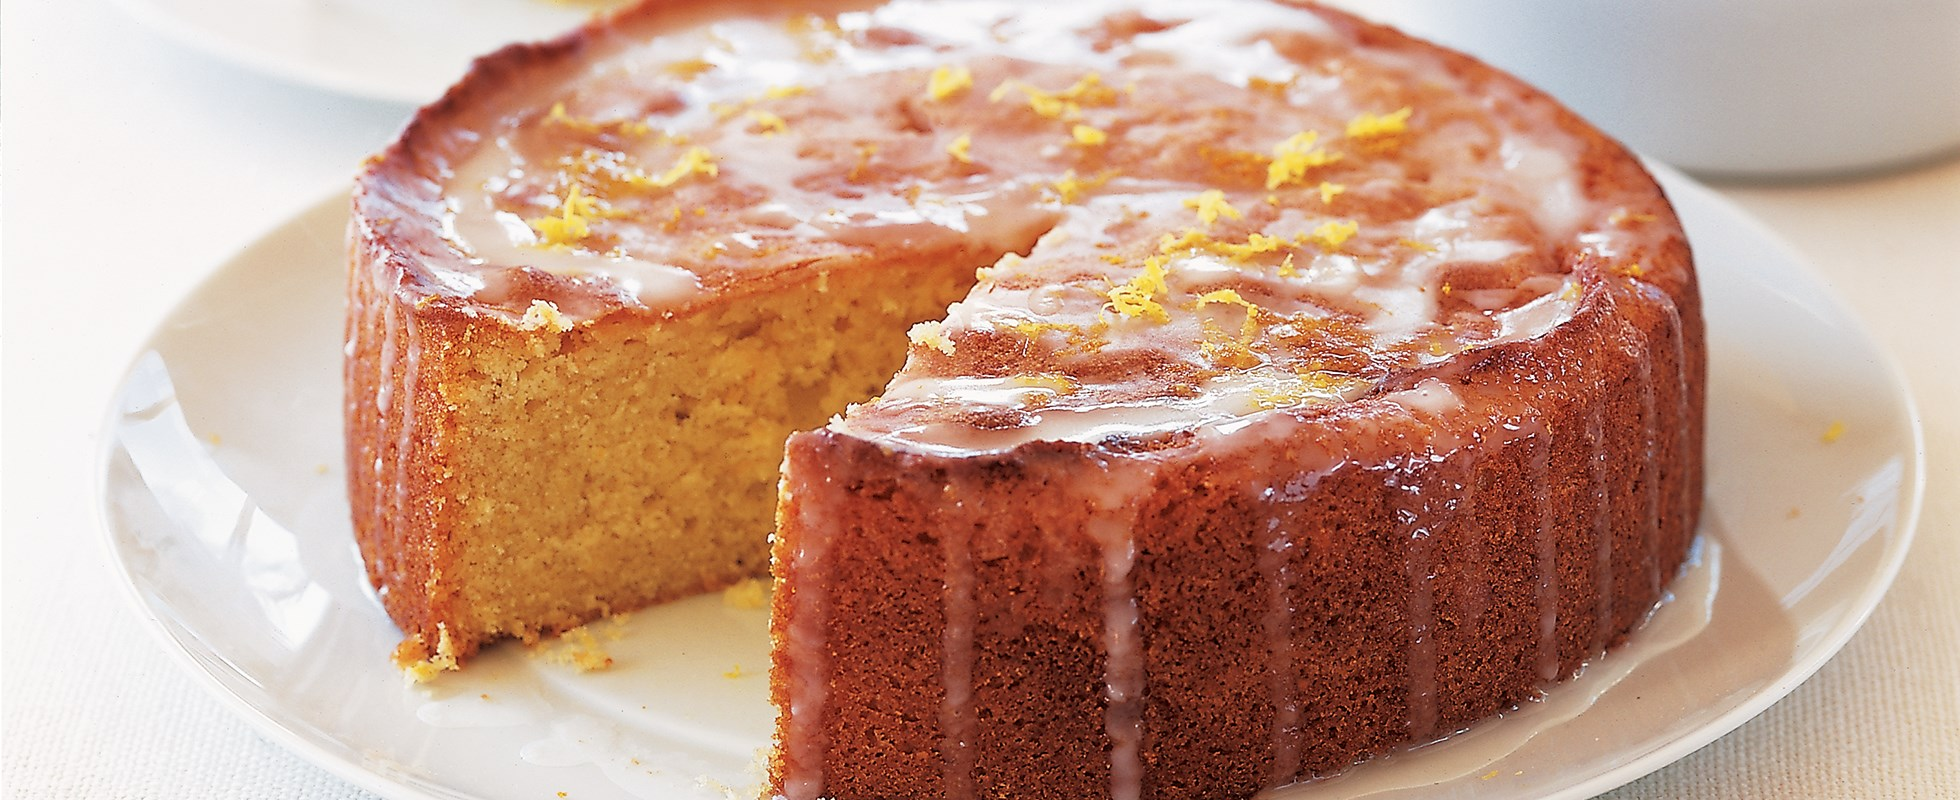 Fruit Cake Recipe Uk Easy: 18 Easy Cake Recipes For Simple Cakes